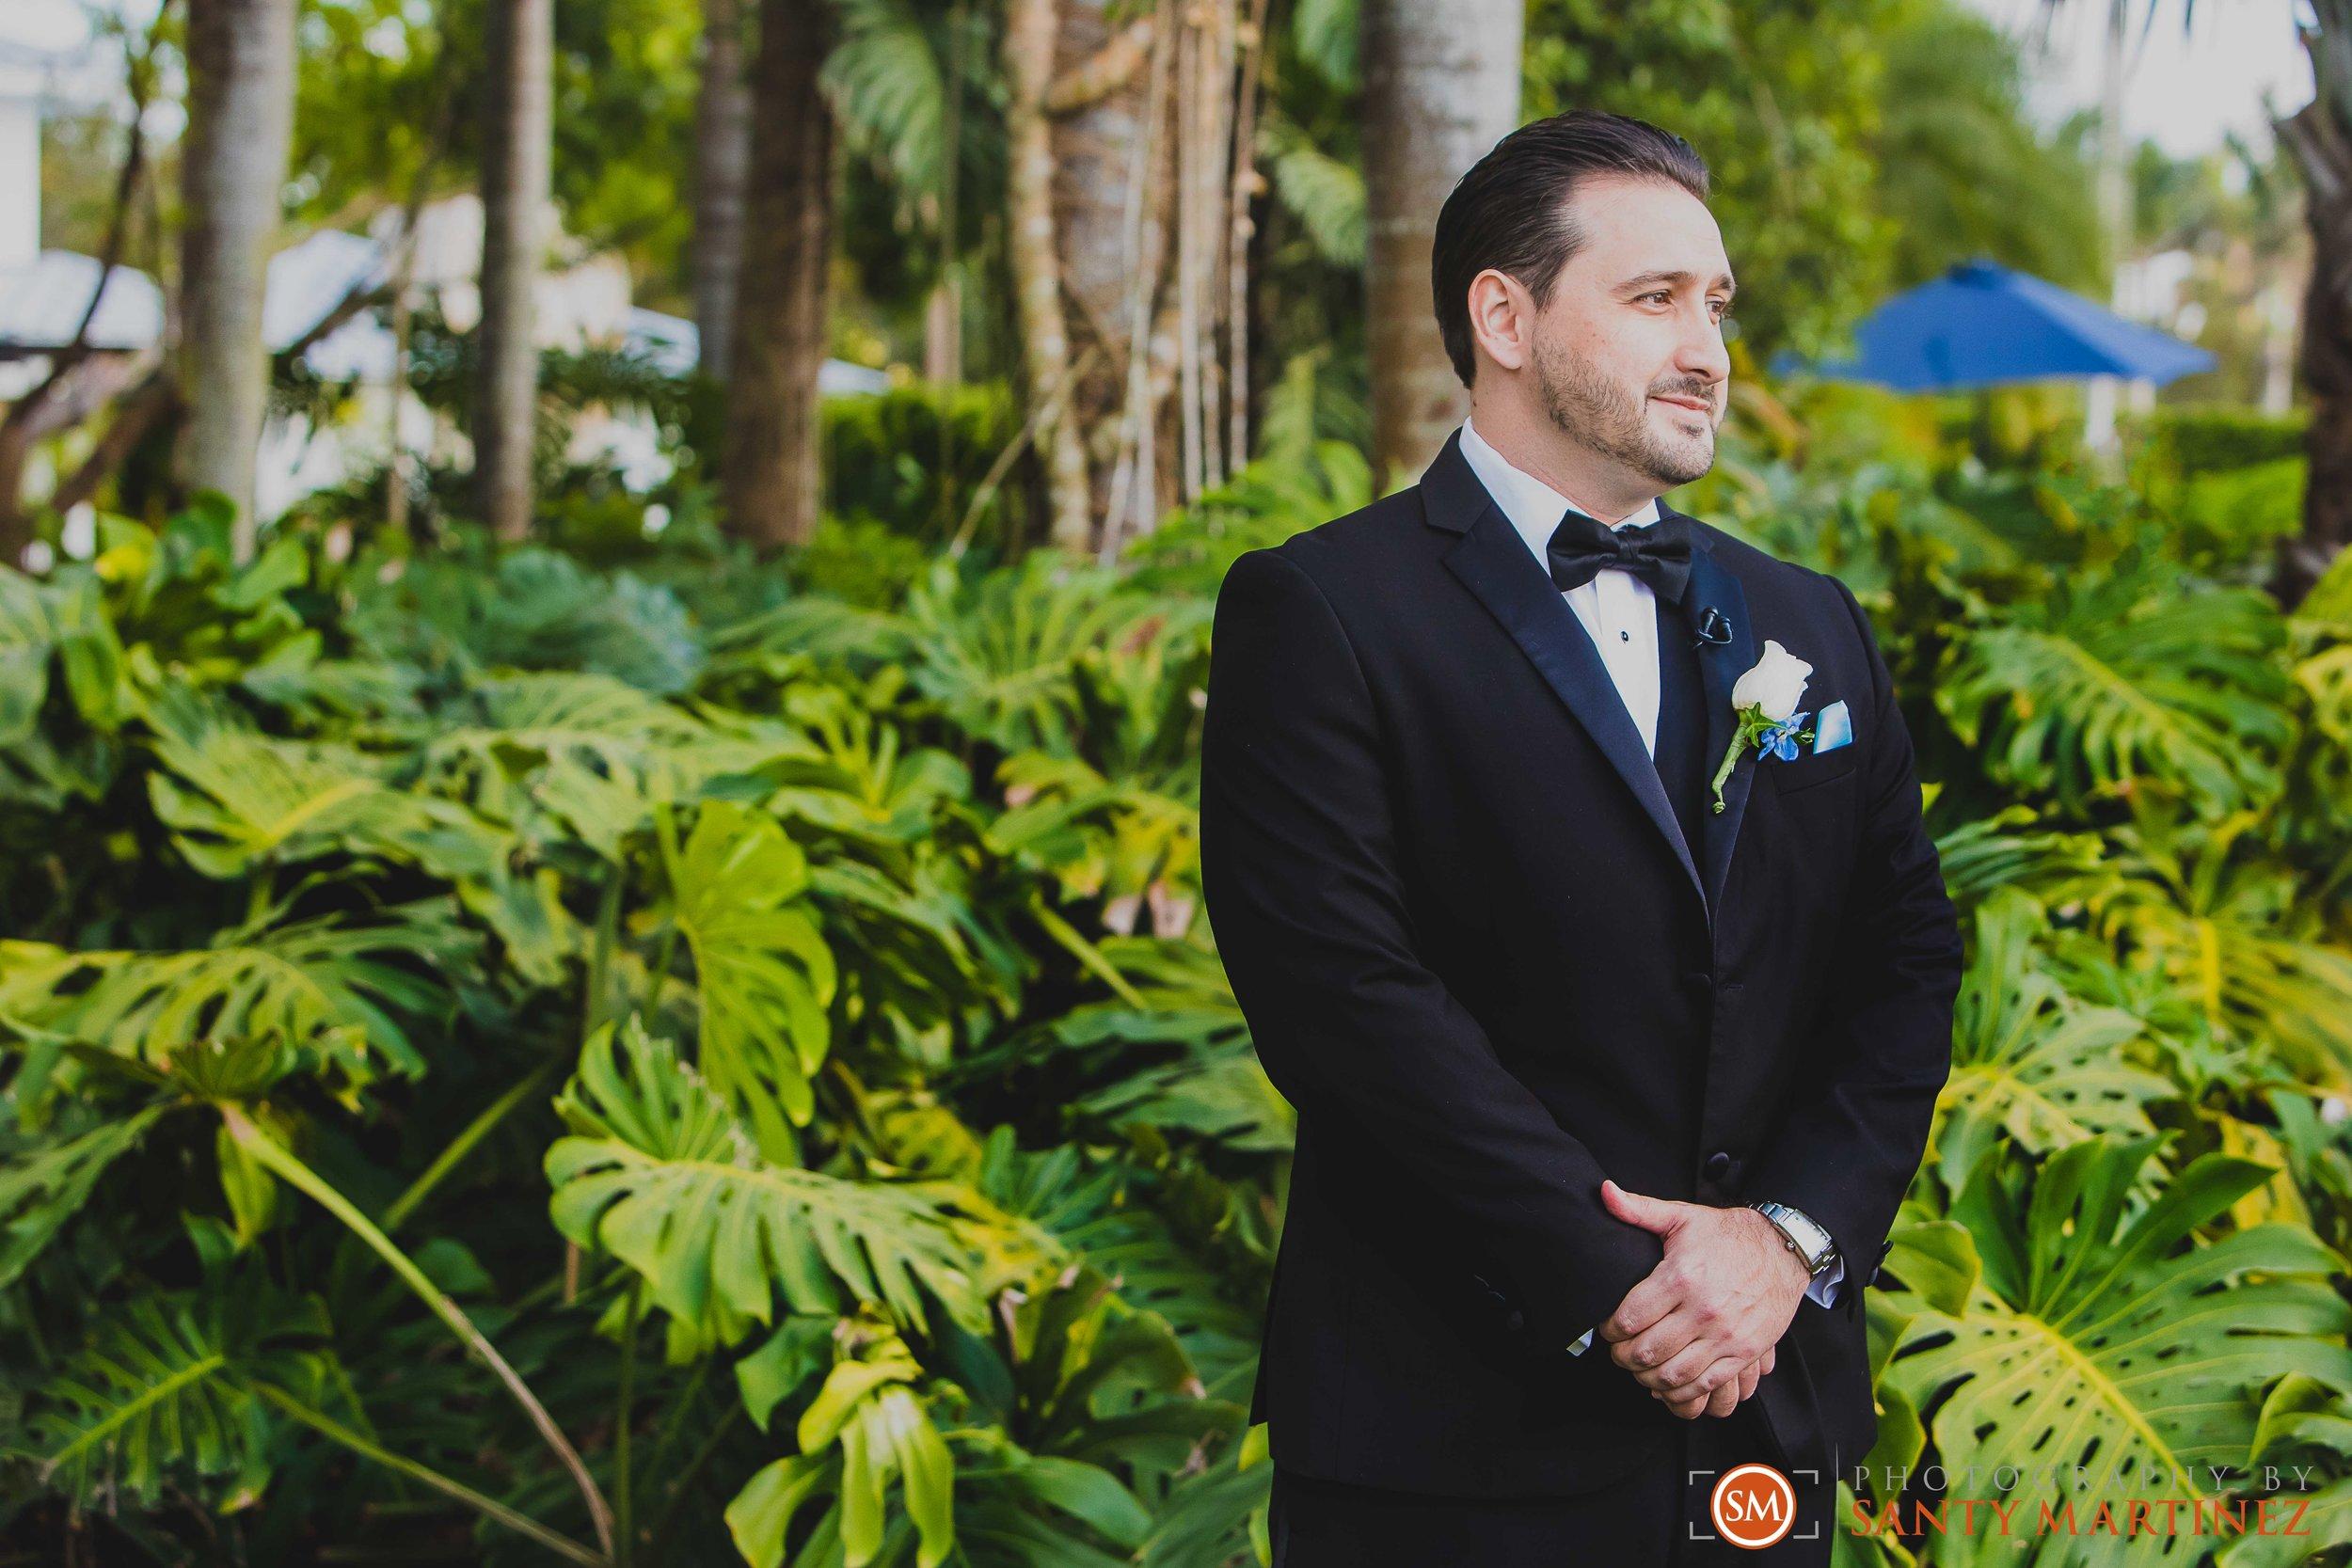 Wedding - Whimsical key West House - Photography by Santy Martinez-15.jpg